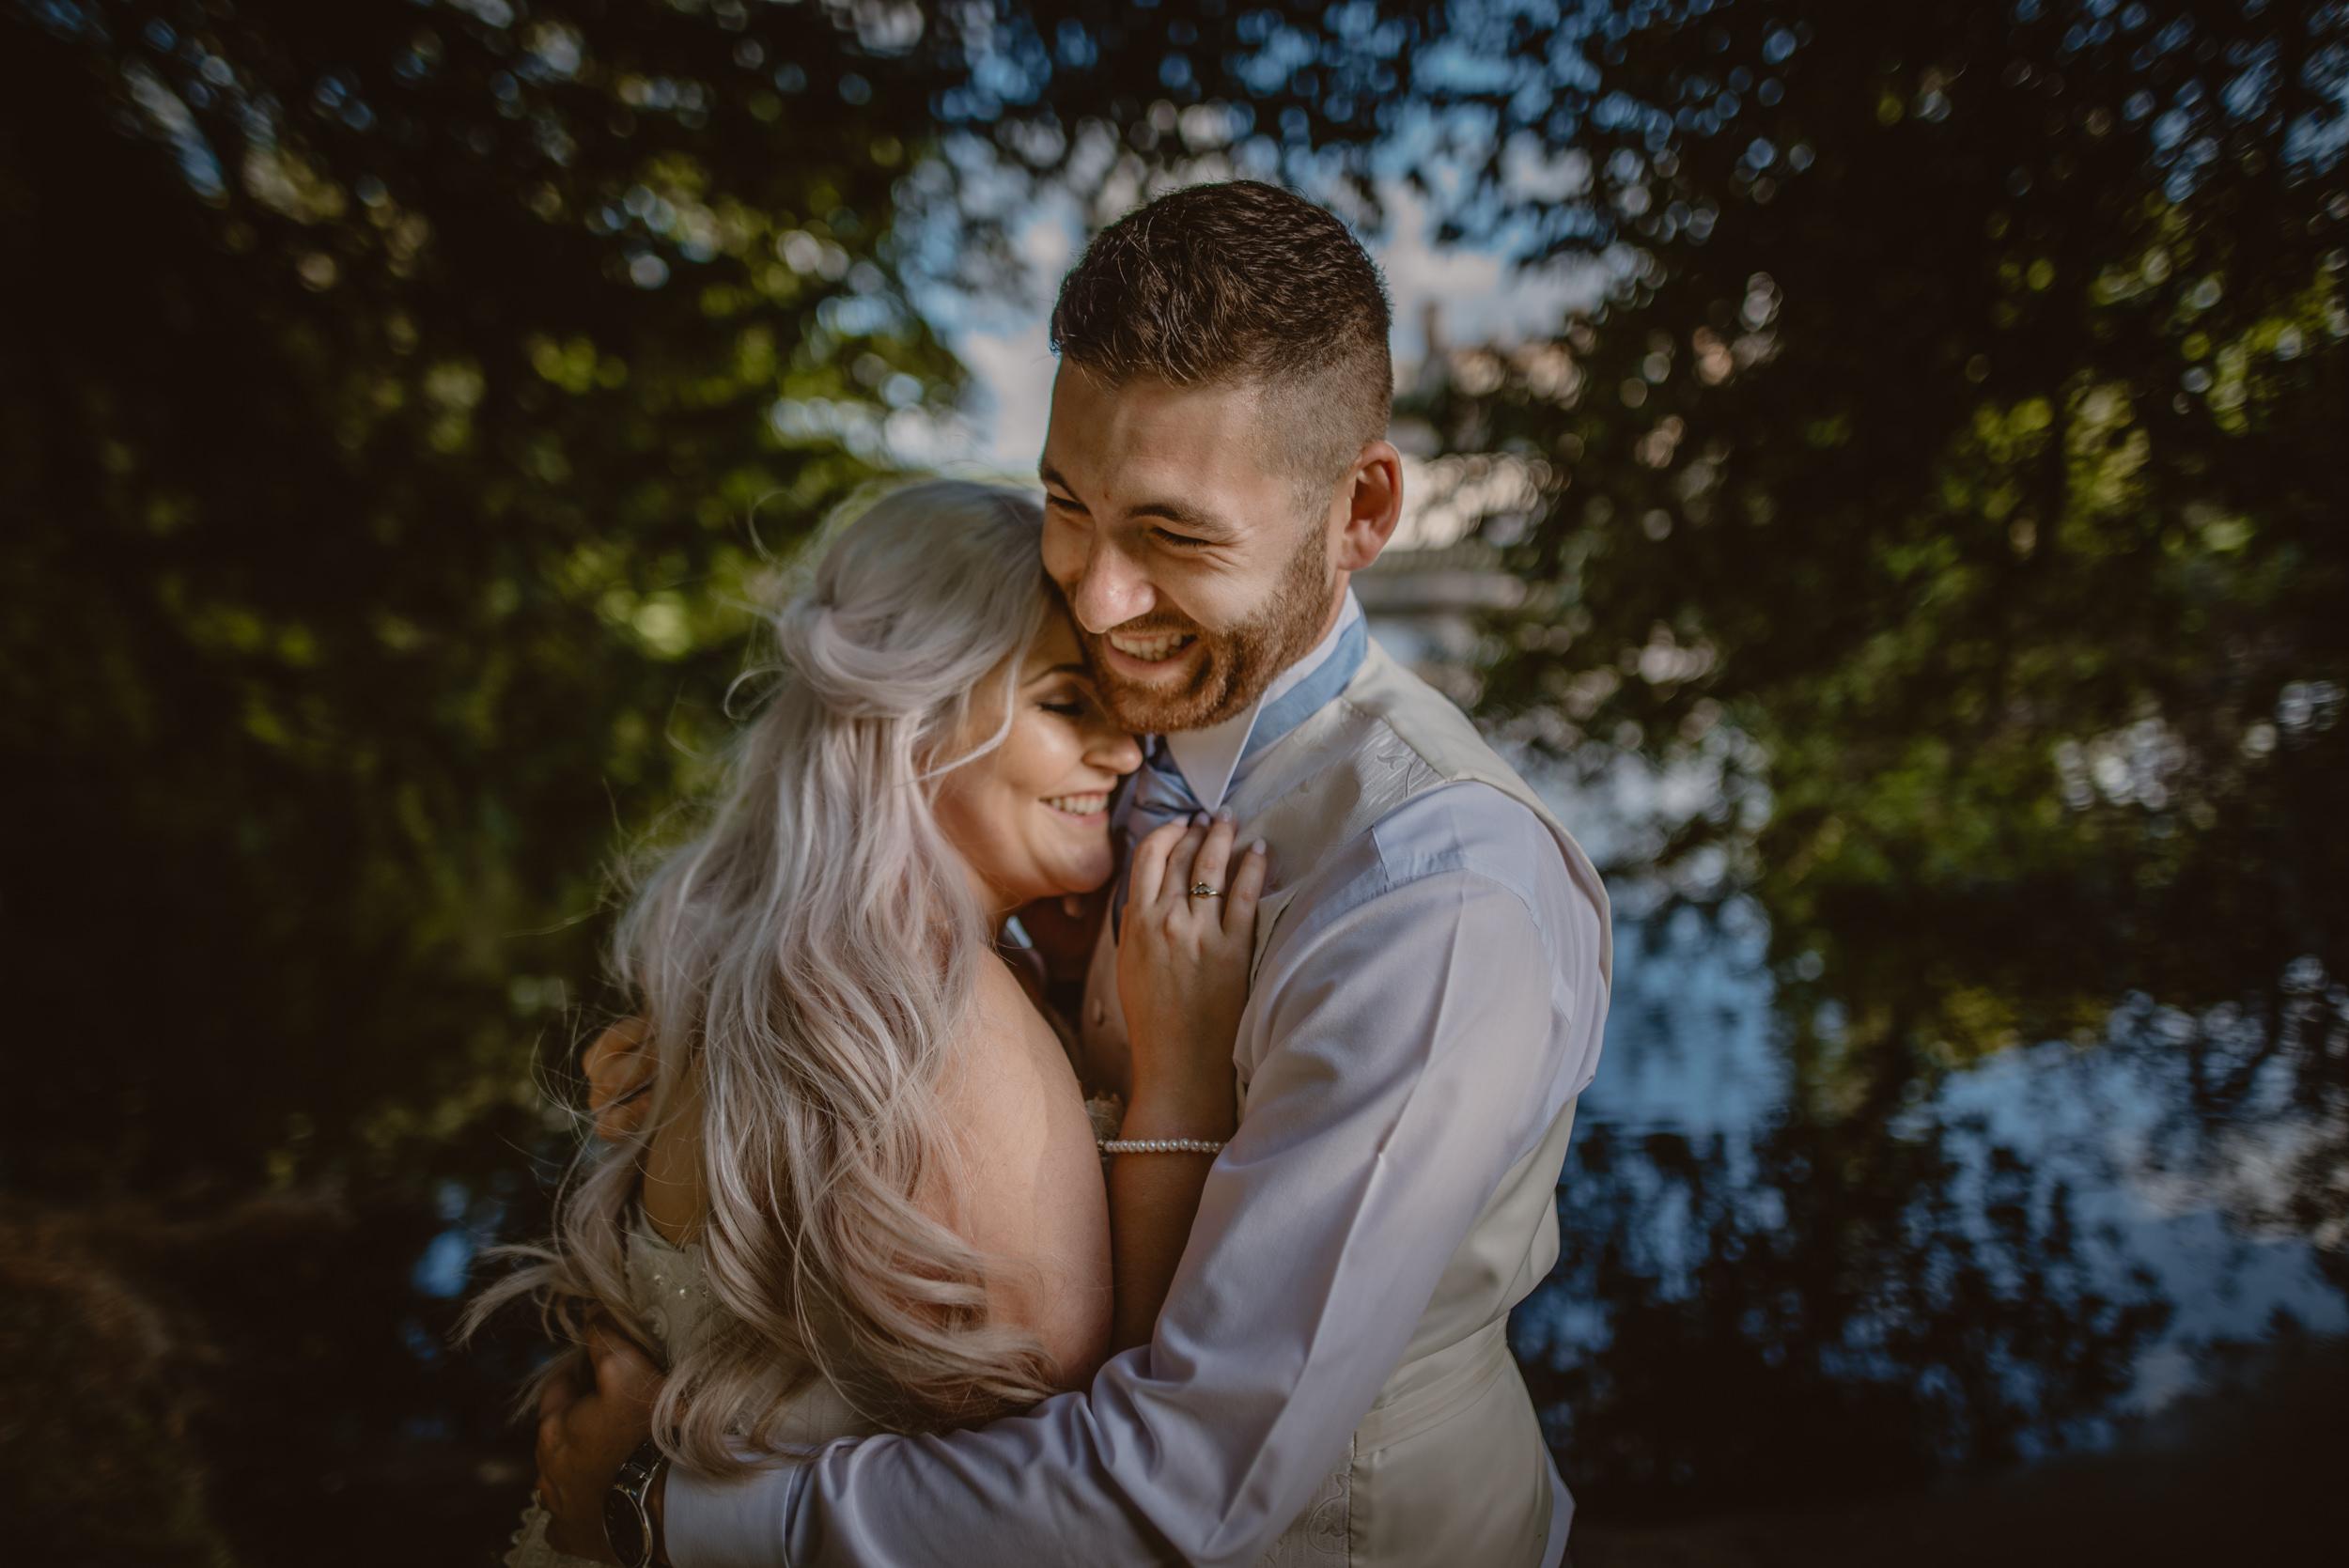 Rachel-and-James-Wedding-Horsley-Towers-State-Manu-Mendoza-Wedding-Photography-498.jpg